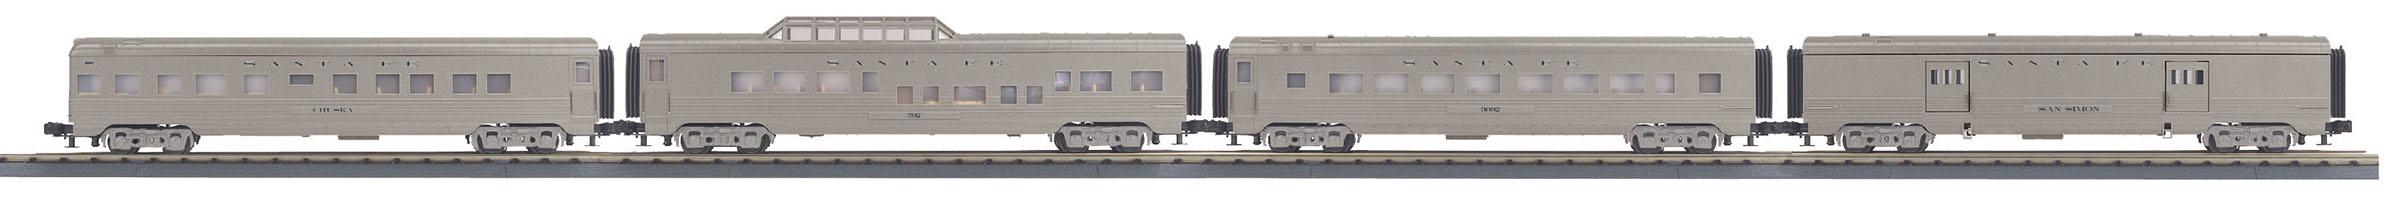 MTH 30-68123 O-27 60' Streamline Passenger Cars SF #3412 4